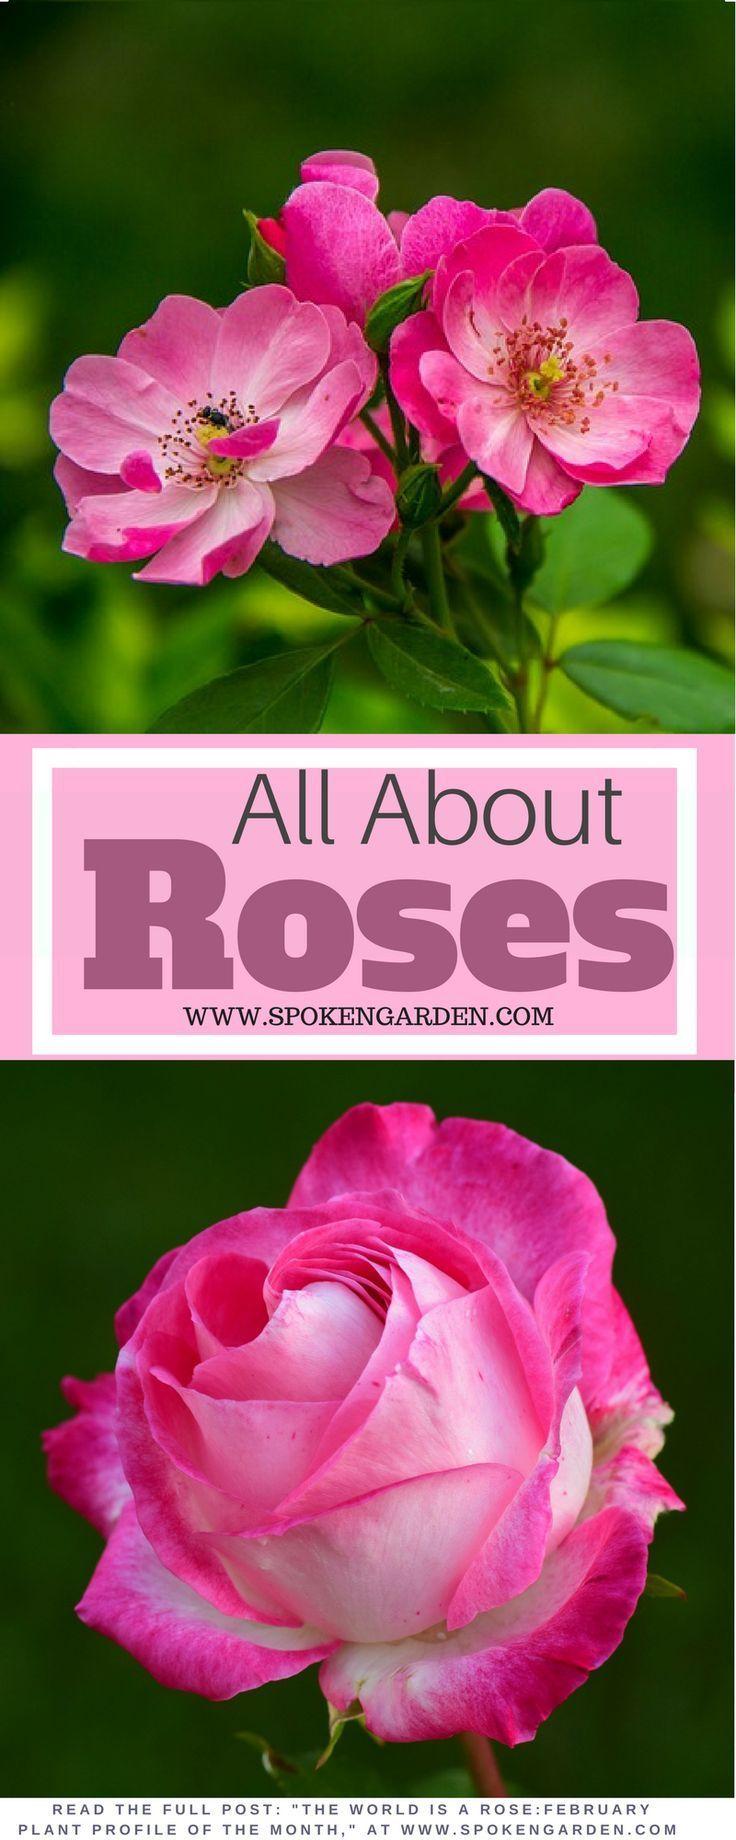 Roses A Gardener S Guide And Plant Profile Spoken Garden